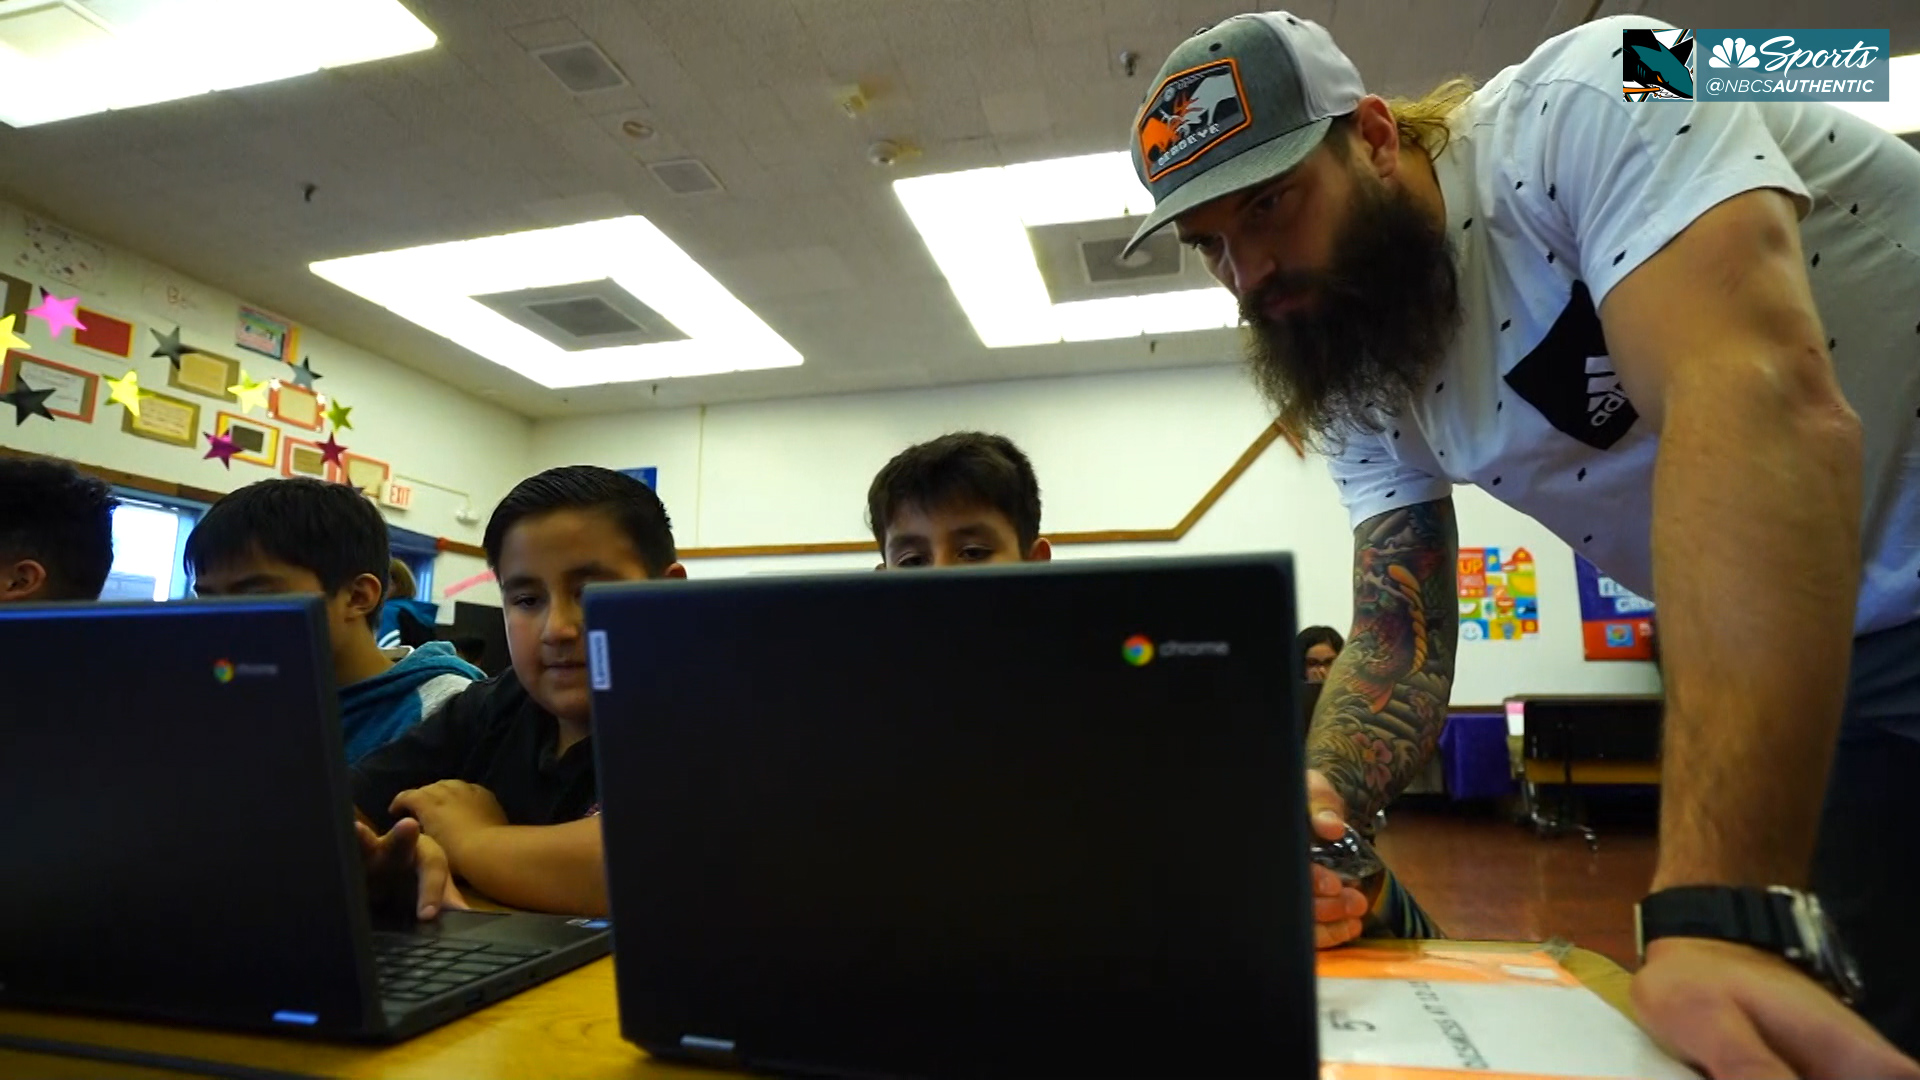 Sharks' Brent Burns helps launch STEM educational program in San Jose